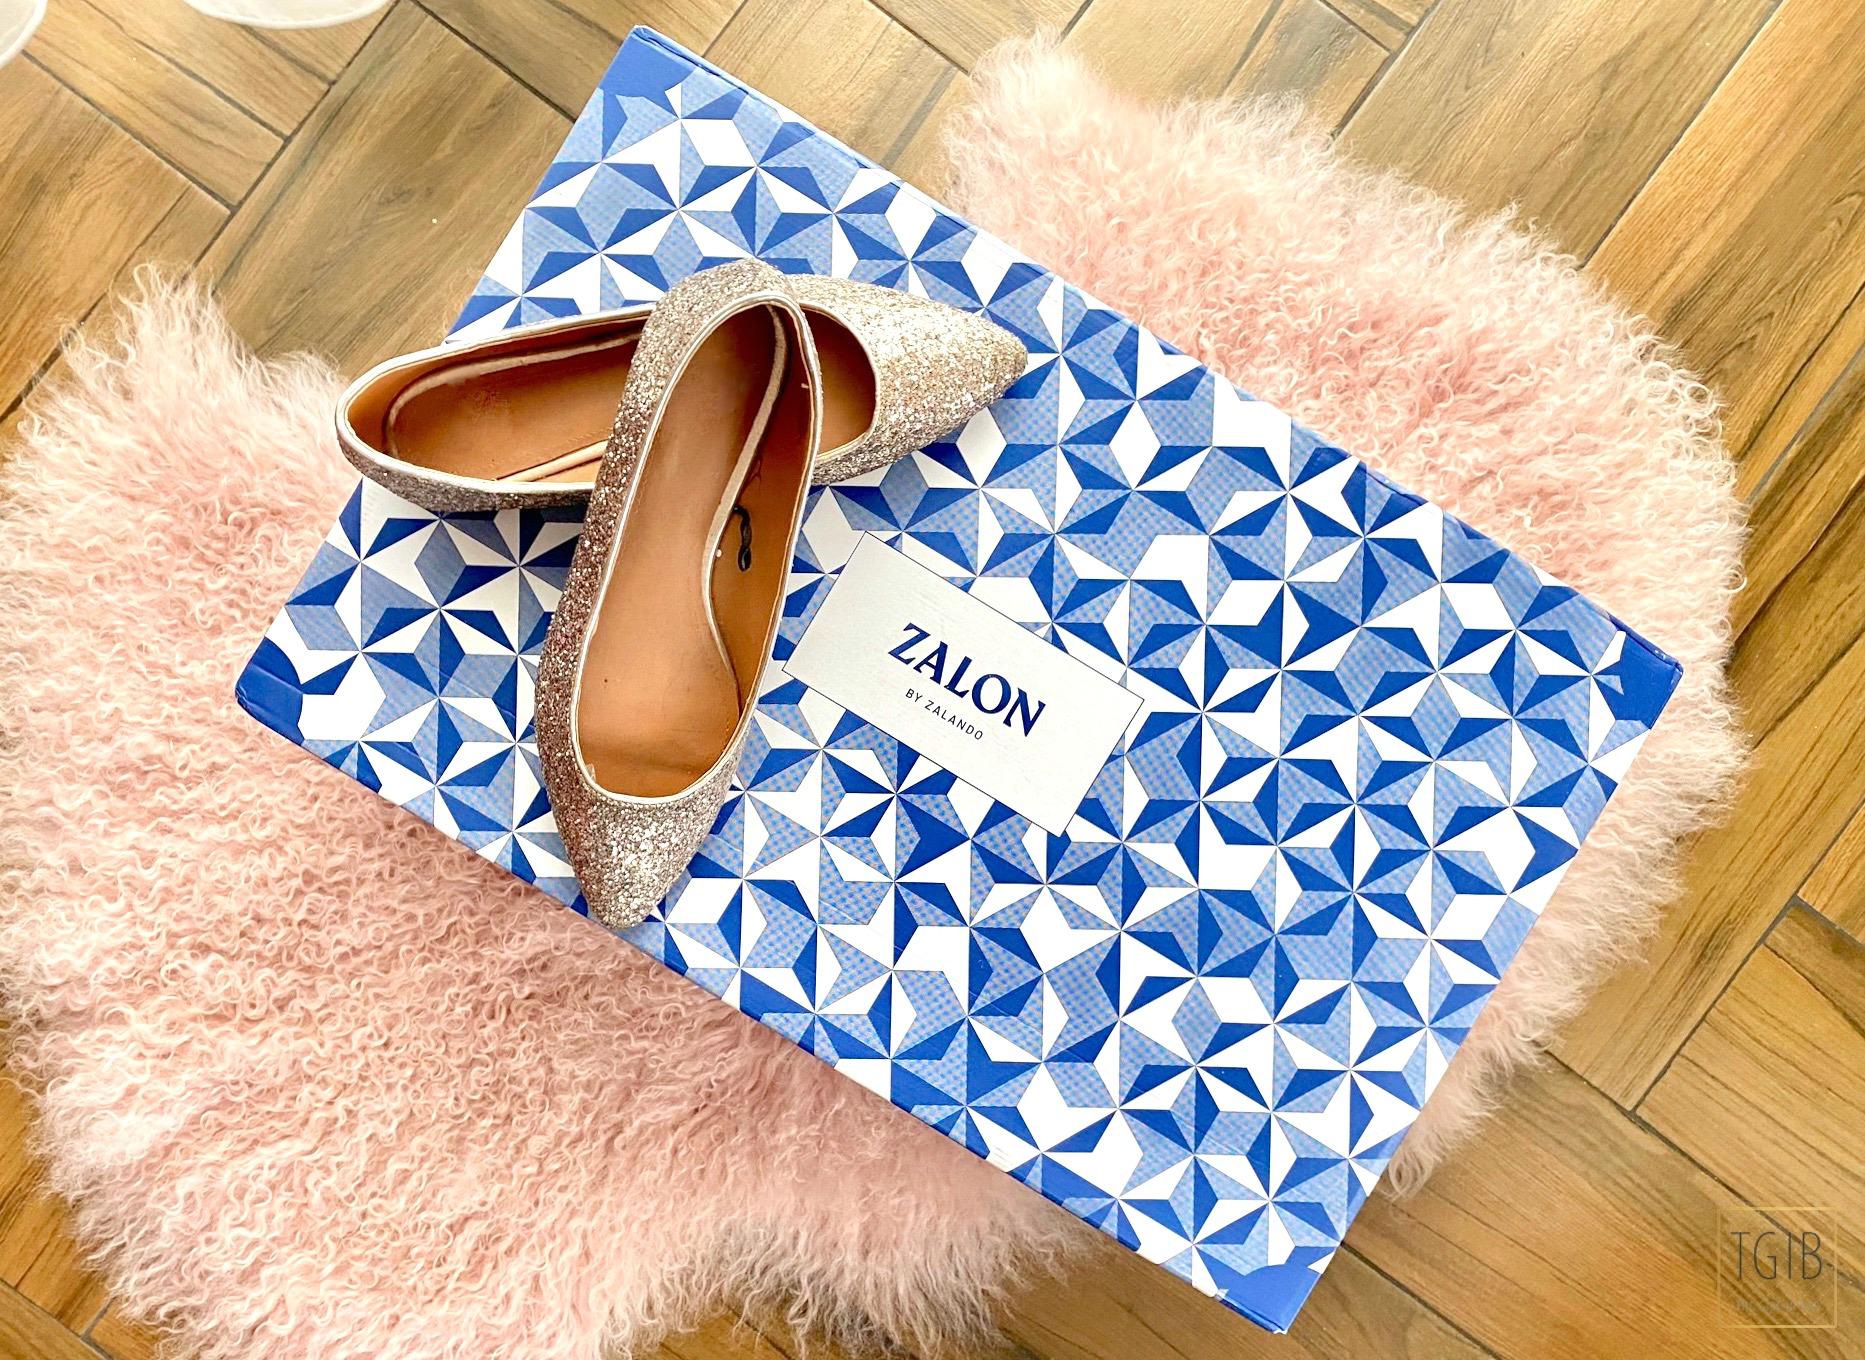 Zalon Box Unboxing